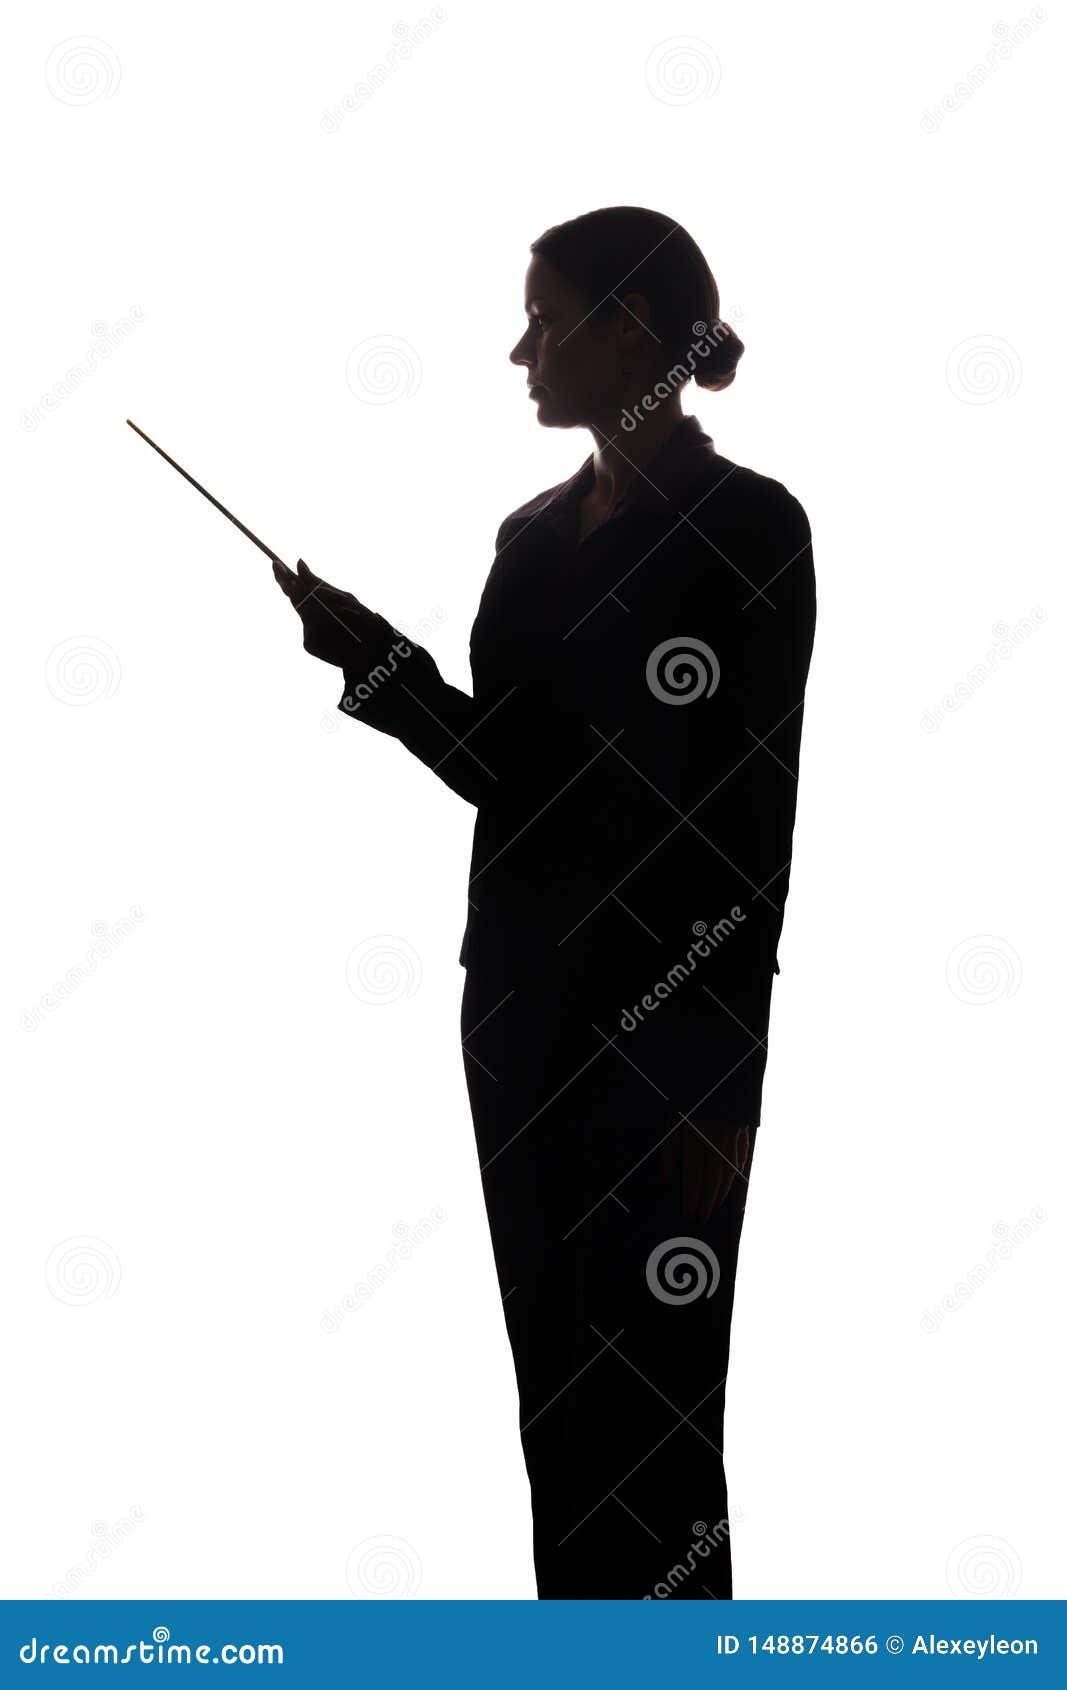 Den unga kvinnan i dr?kt visar pekaren fram?triktat, sidosikten - kontur